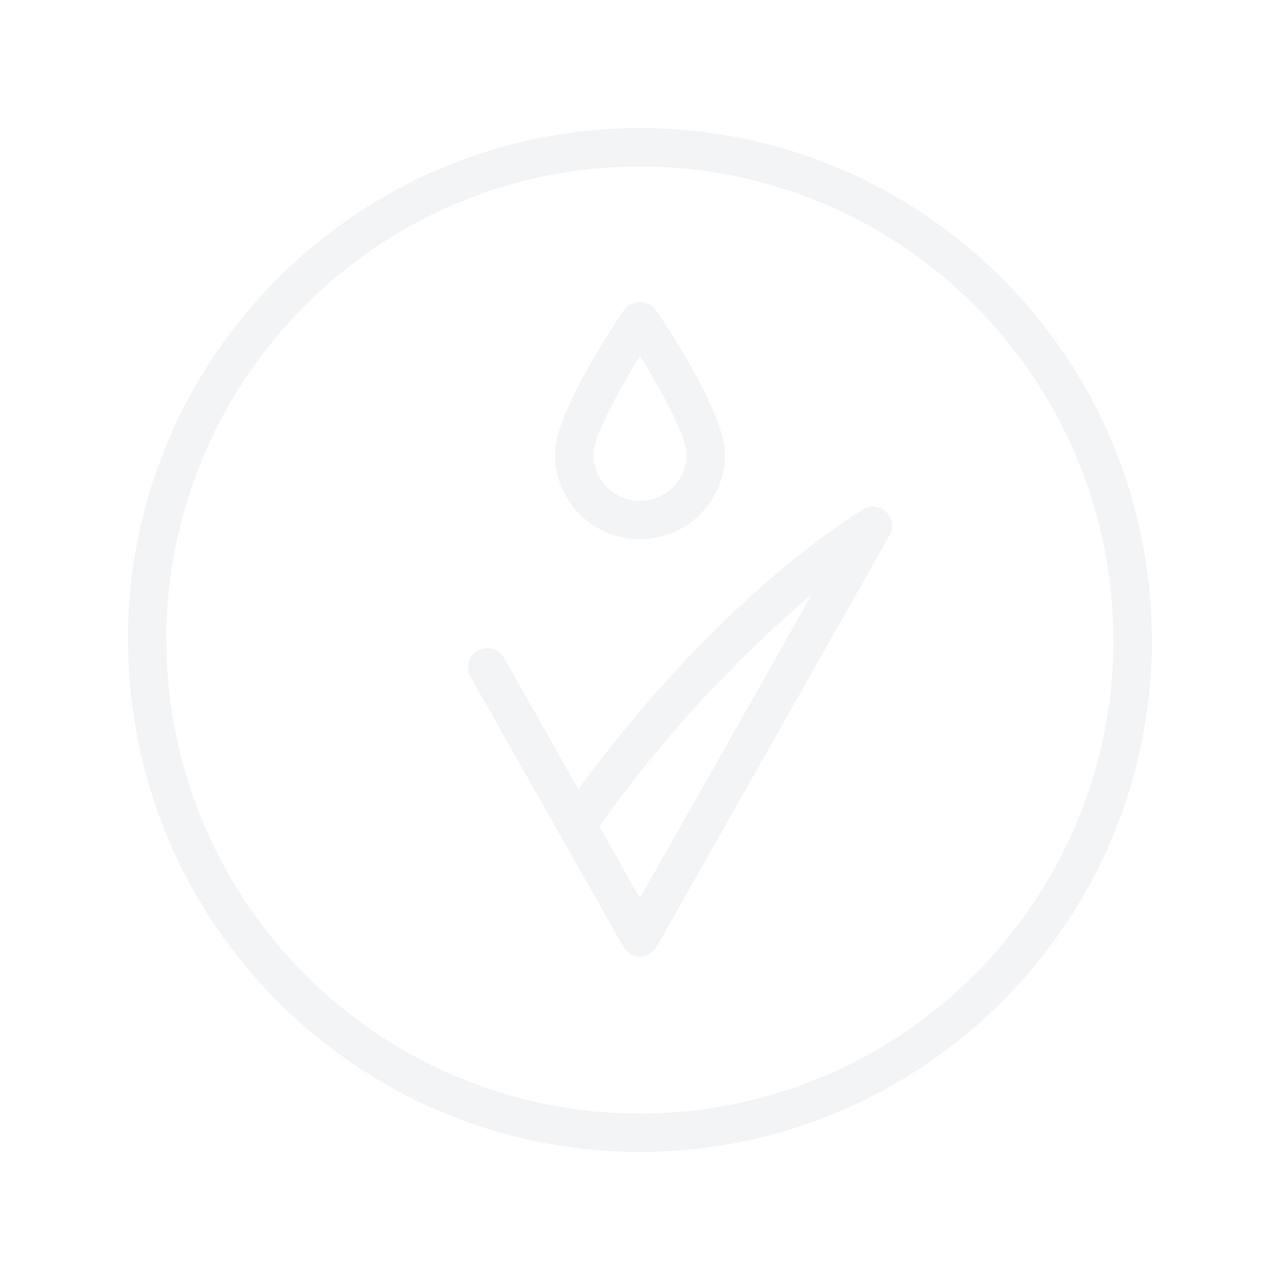 SHISEIDO Refreshing Cleansing Sheets 30pcs